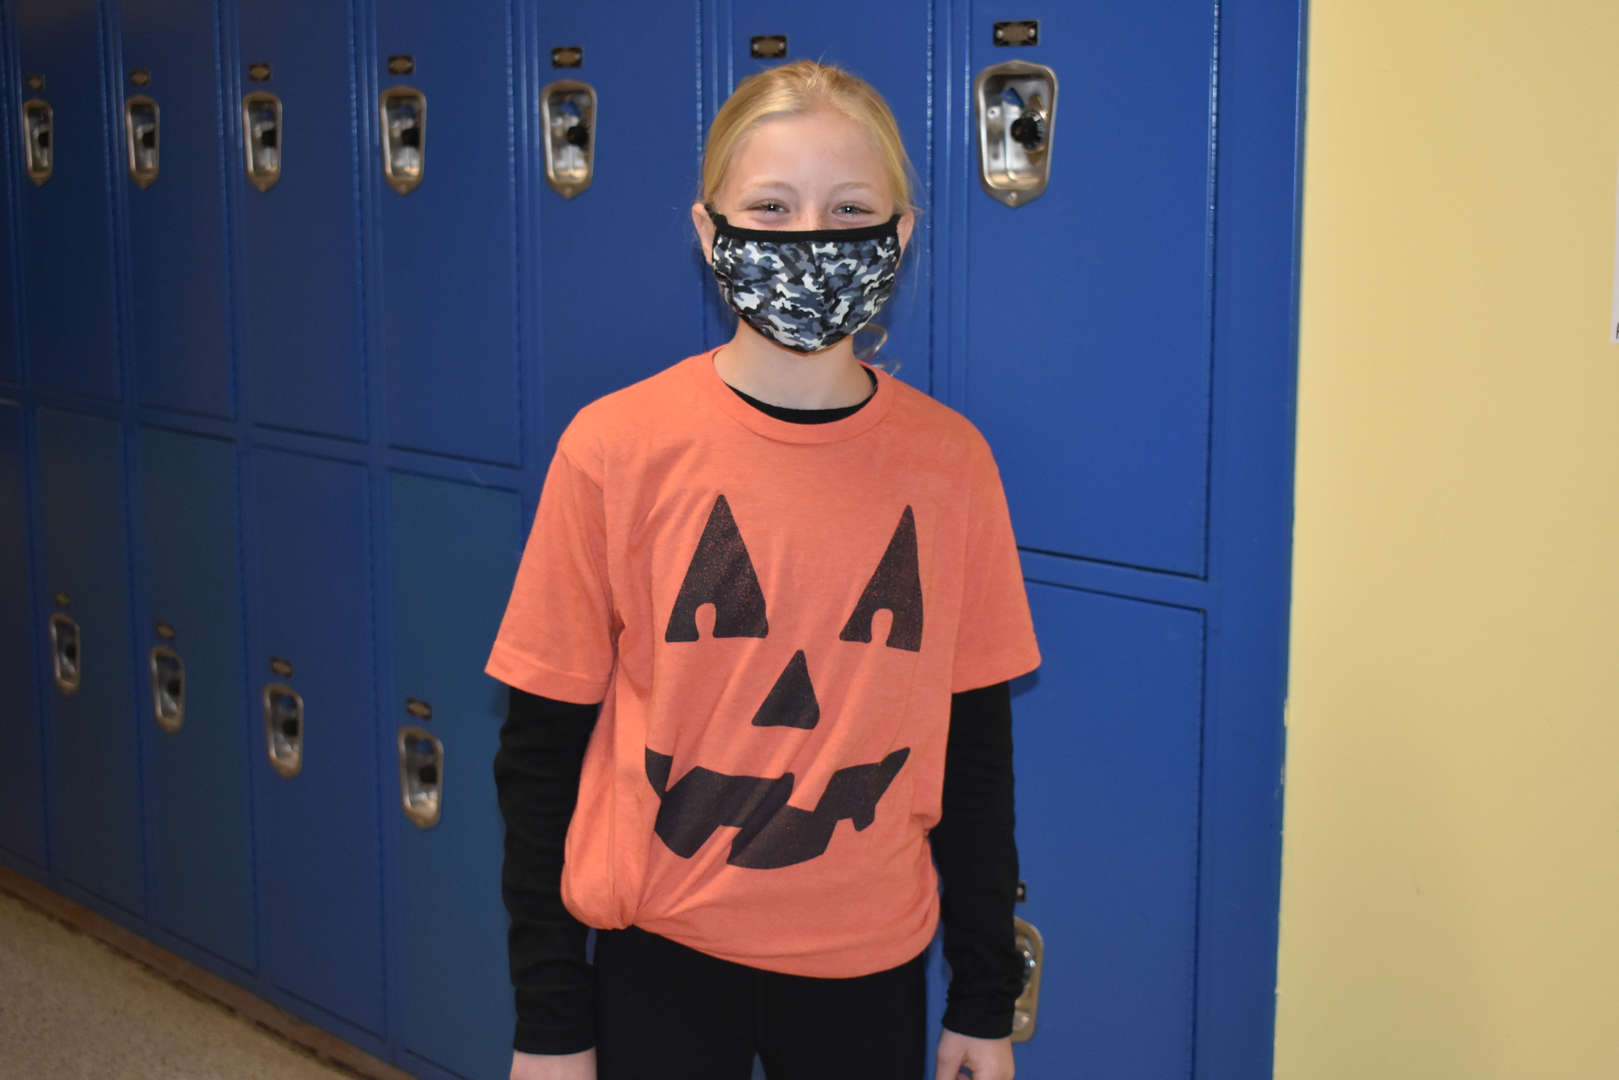 pumpkin shirt in the hallway